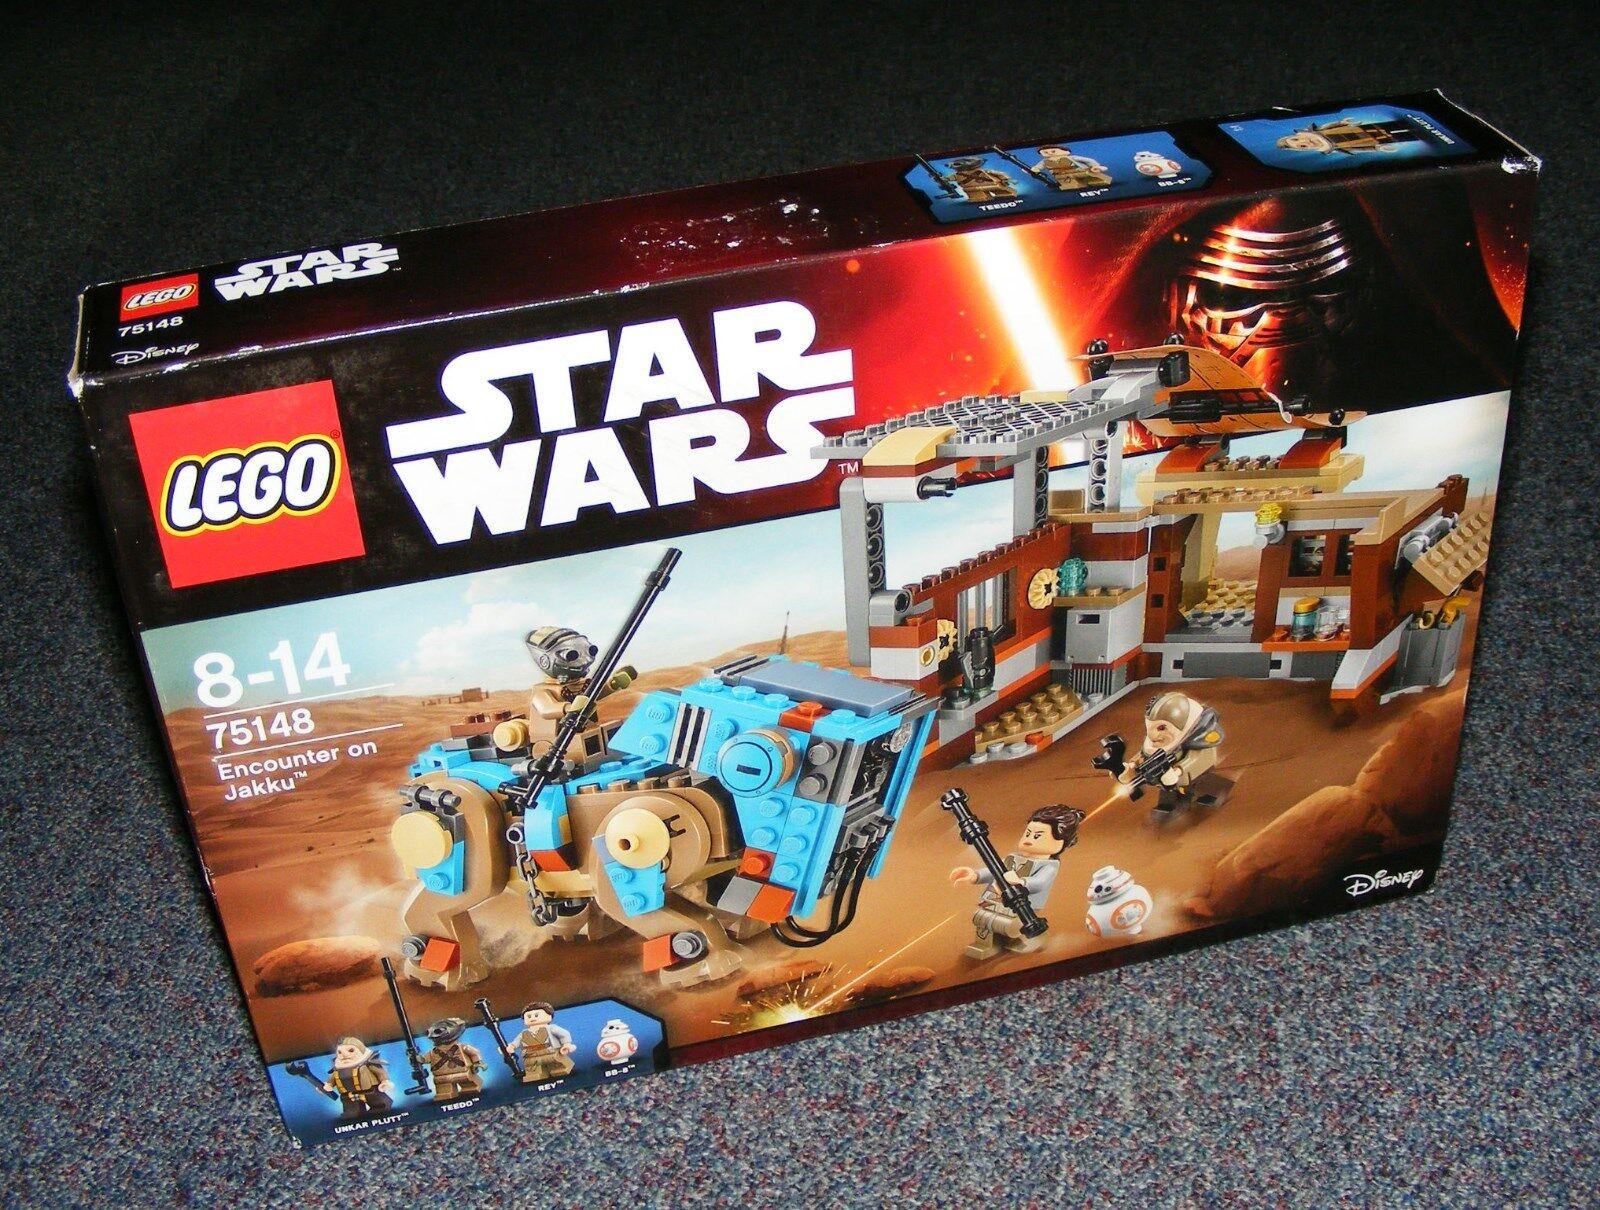 STAR WARS LEGO 75148 ENCOUNTER ON JAKKU B-STOCK BRAND NEW SEALED BNIB